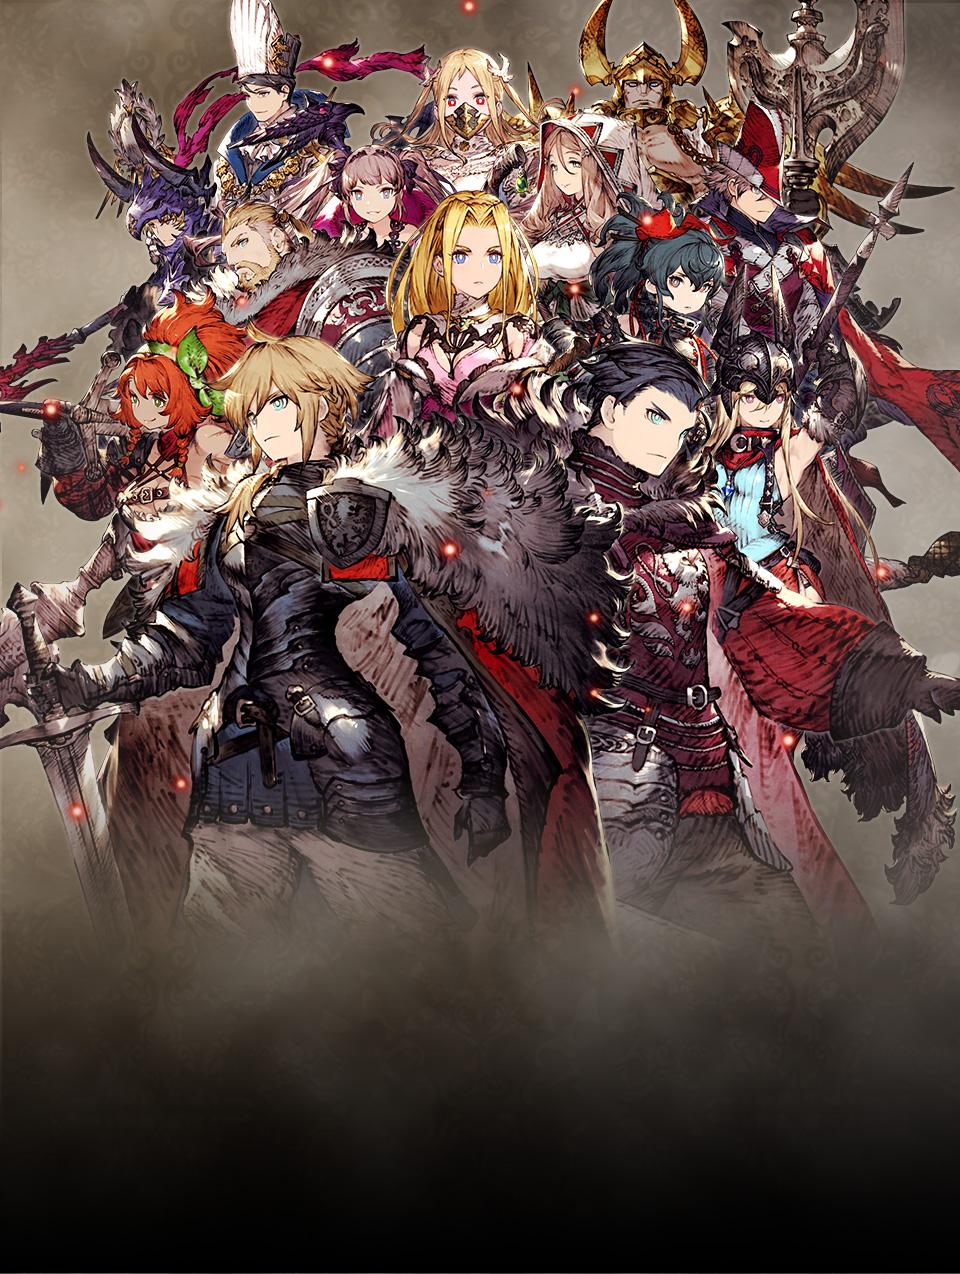 Final Fantasy Brave Exvius Wallpaper 960x1274 Download Hd Wallpaper Wallpapertip